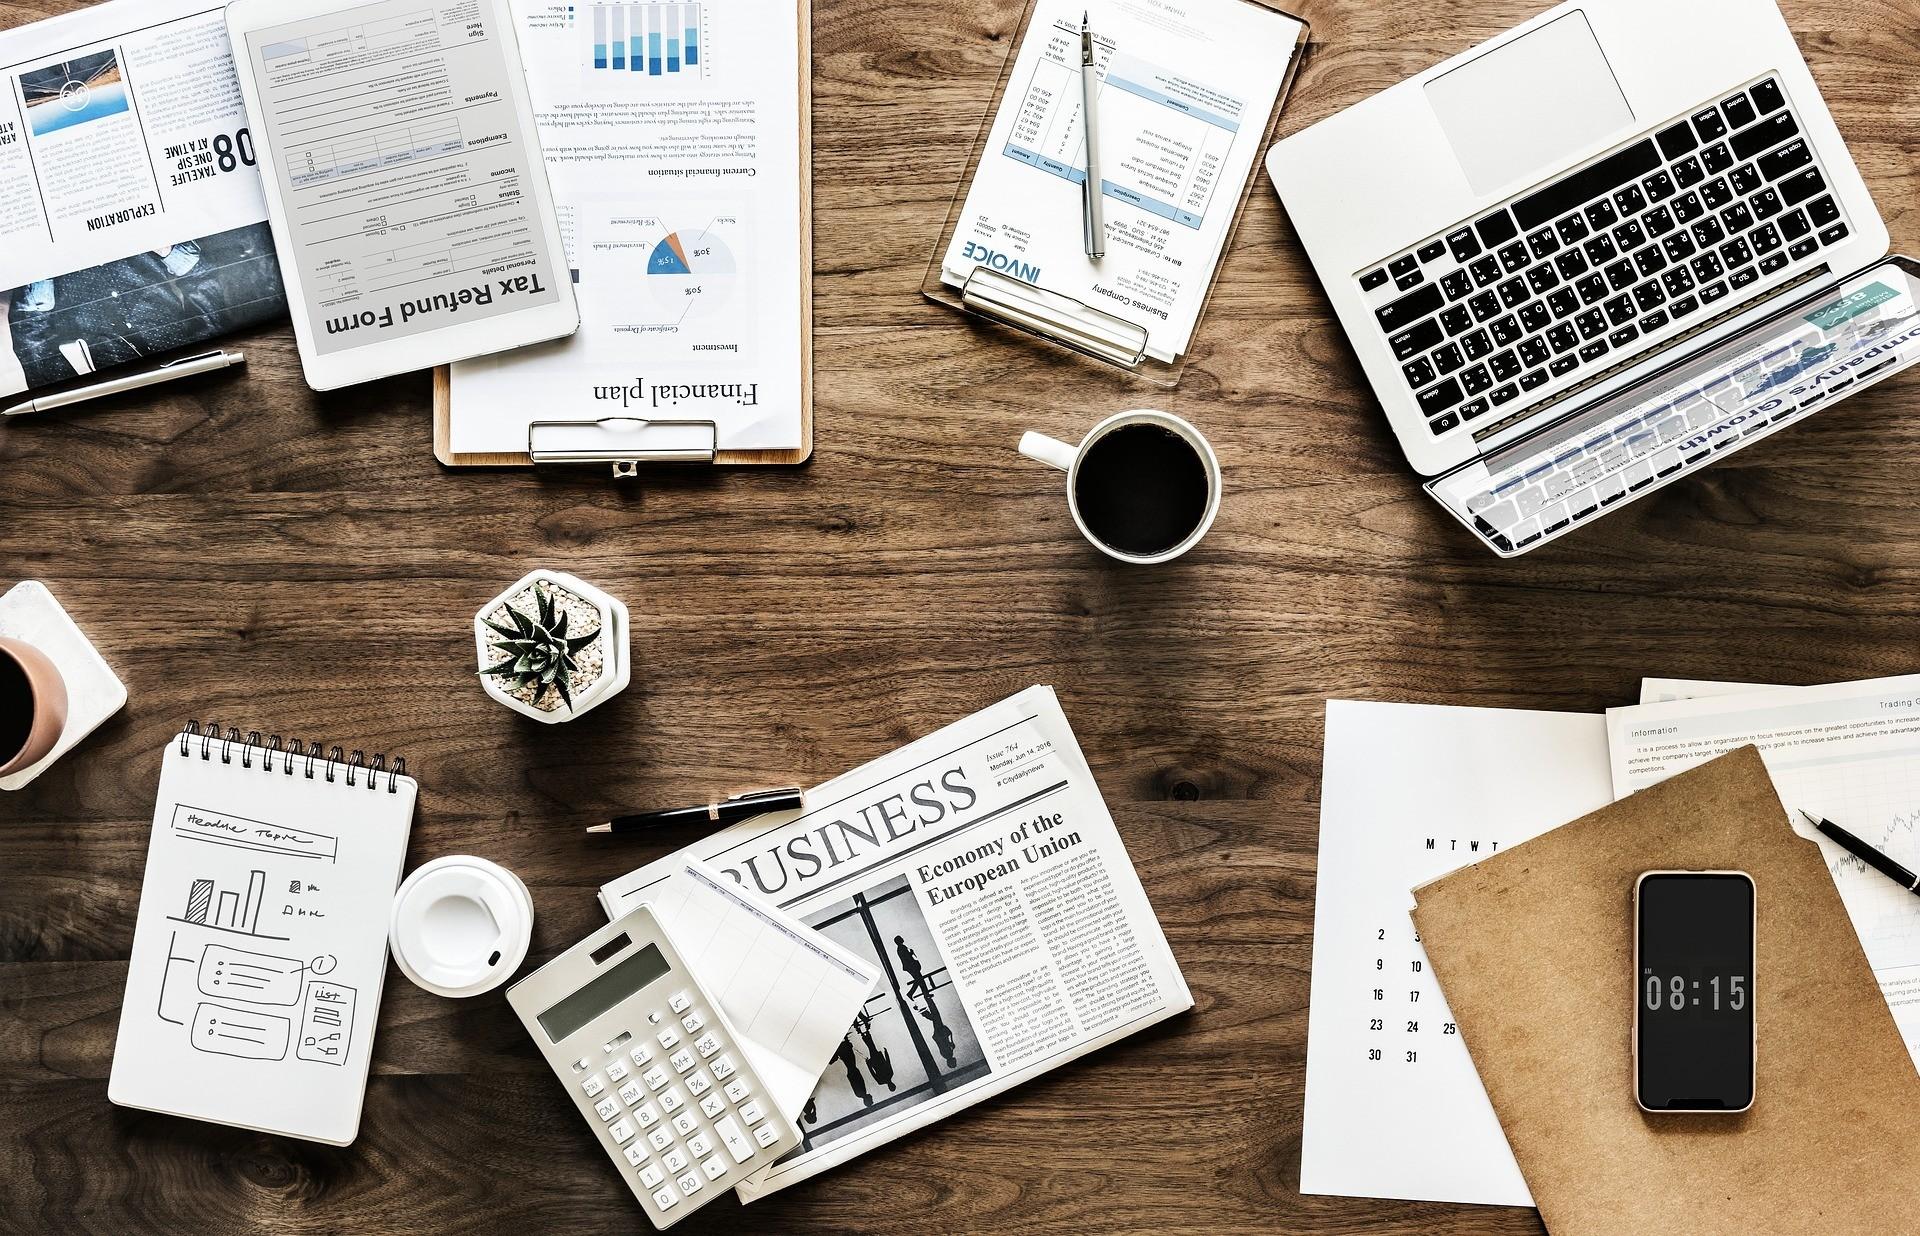 Digitalization as a business process - Preparing business travel